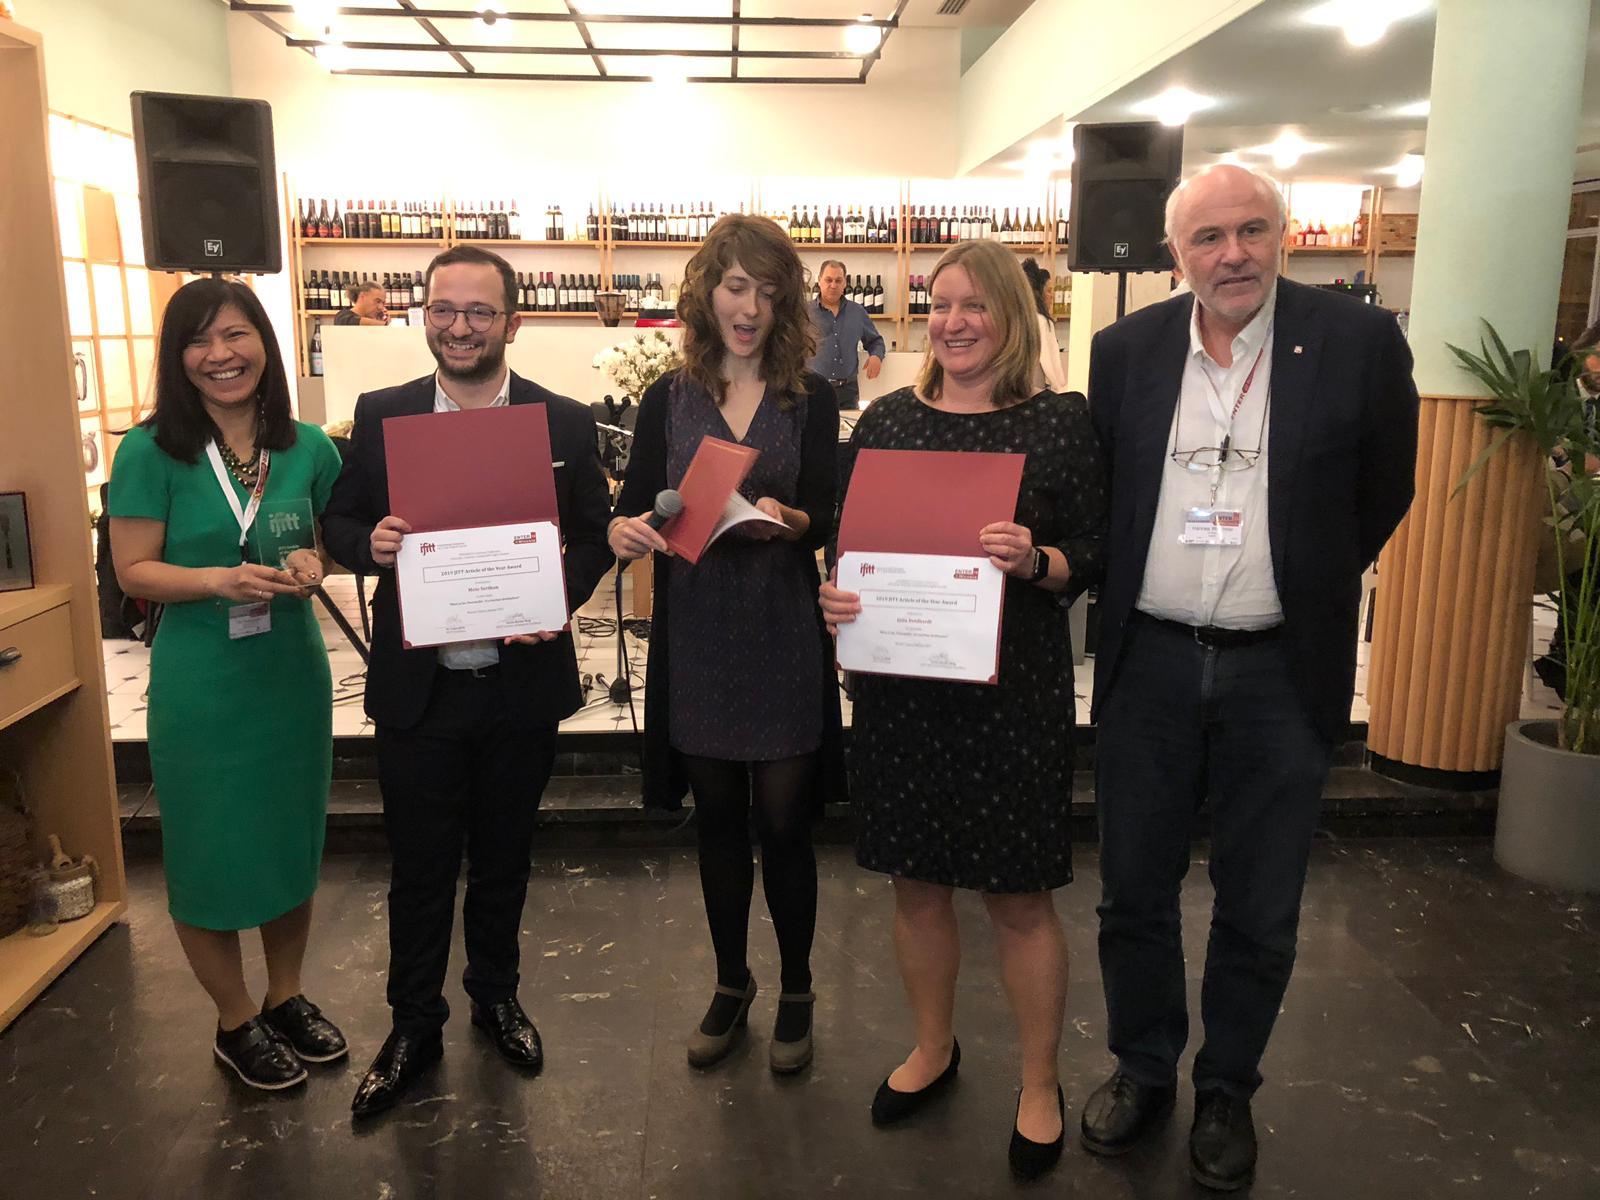 Mete Sertkan, Julia Neidhardt and Prof. Werthner at ENTER 2019. Photo by Prof. Cihan Çobanoğlu